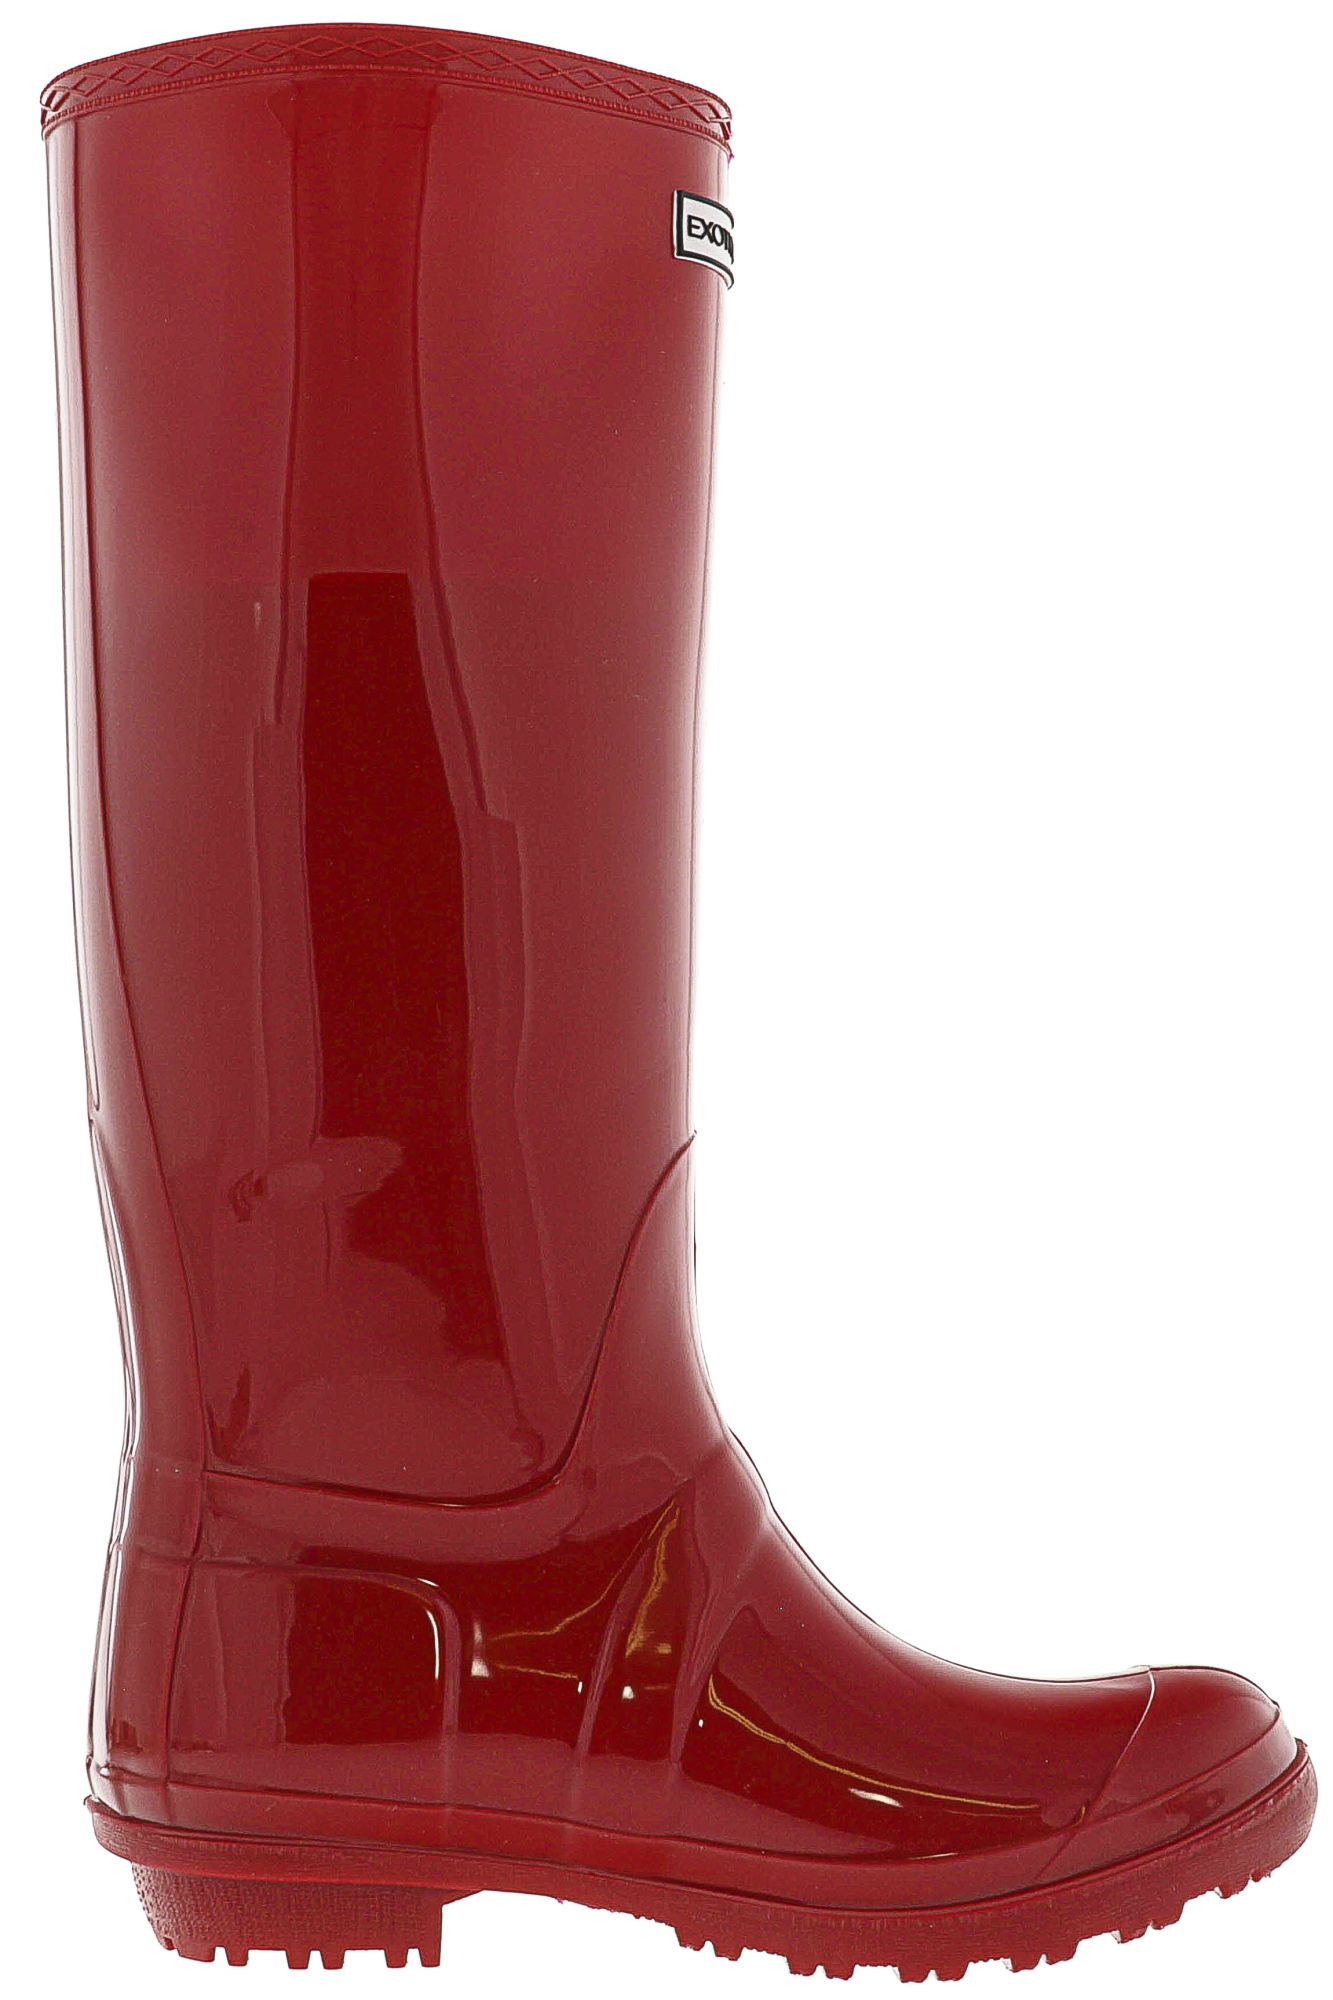 Exotic-Identity-Original-Tall-Rain-Boots-Waterproof-Premium-PVC-Nonslip-So thumbnail 23